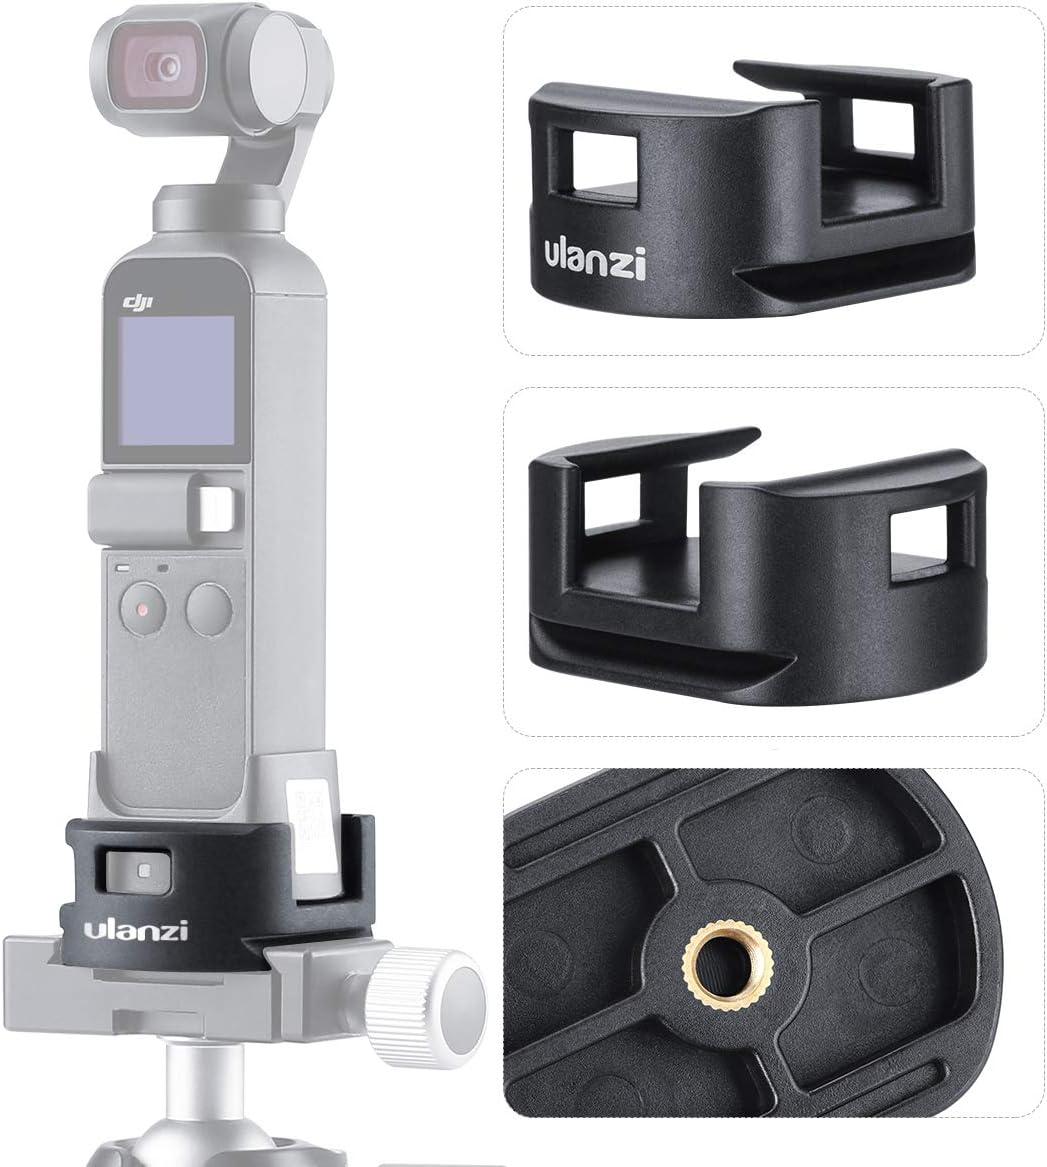 "OP-4 Tripod Adapter Base Compatible with DJI OSMO Pocket Gimbal WiFi Module Base Accessory Bottom 1/4"" Screw Adapter"